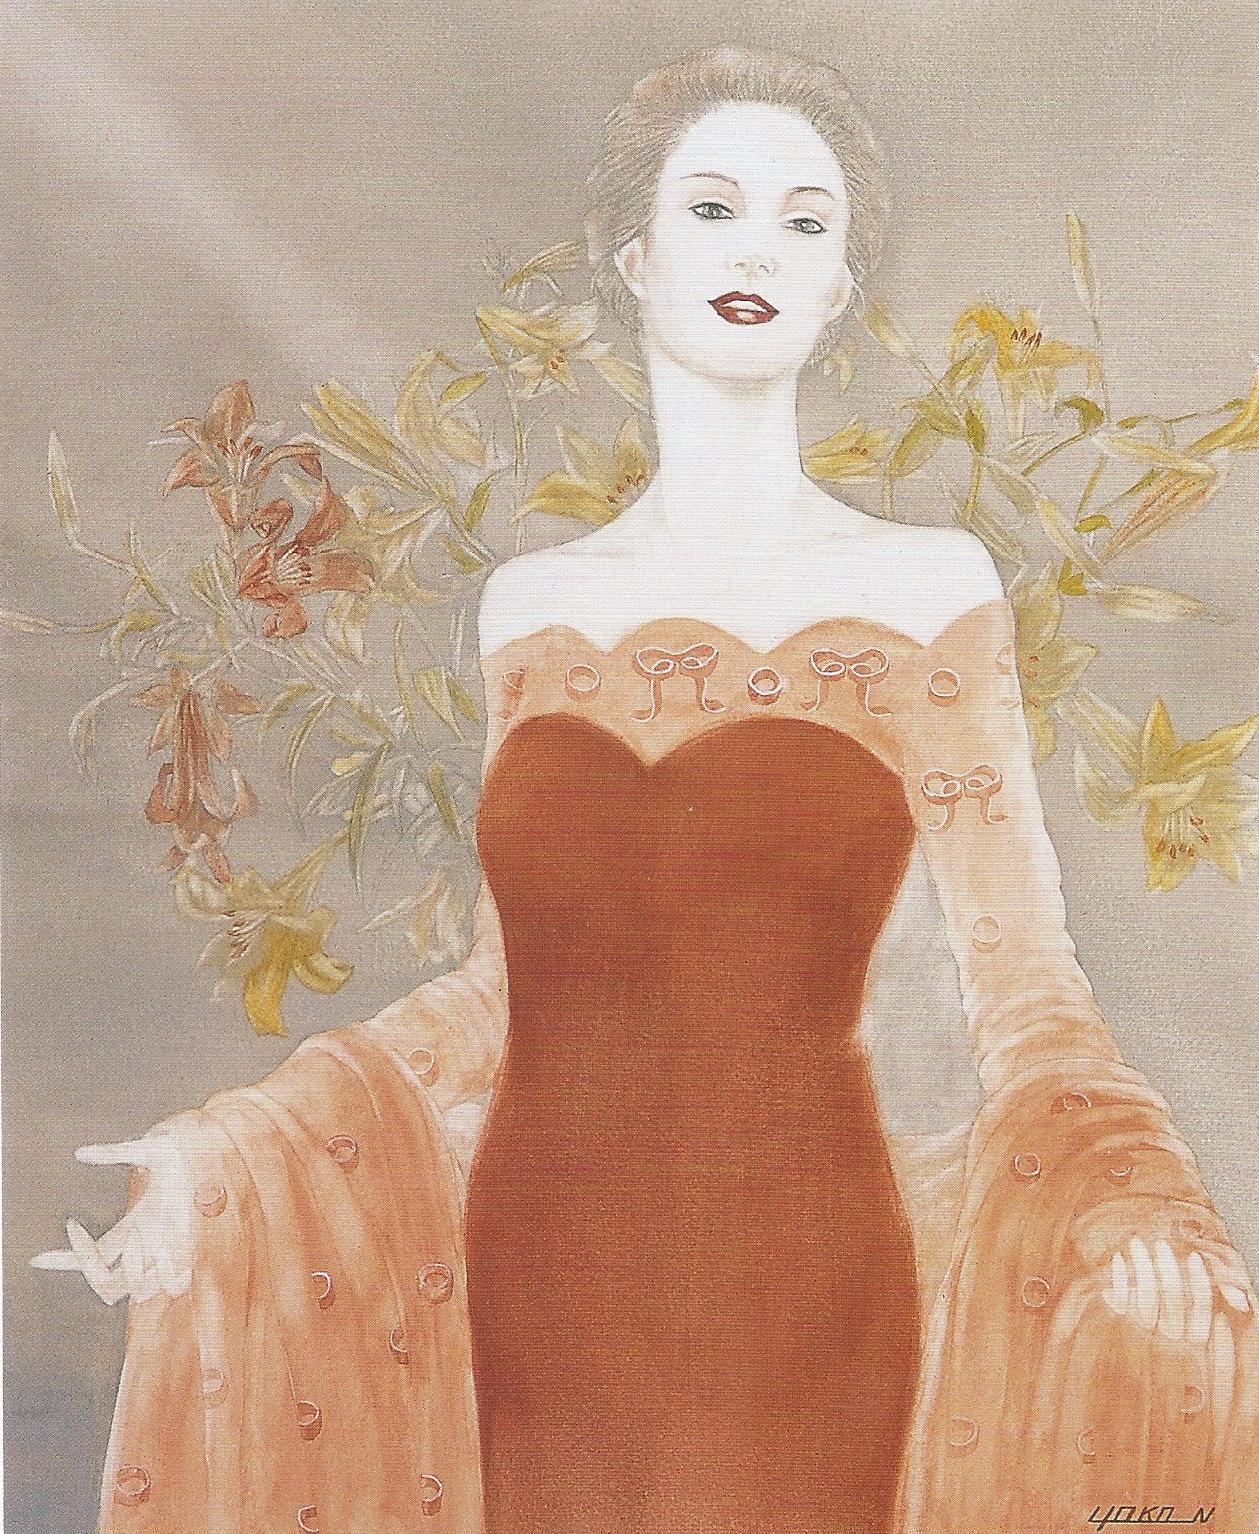 "Yoko Nakagawa: You are Welcome,  Watercolor on paper, 20.4"" x 17.4"", 2001"